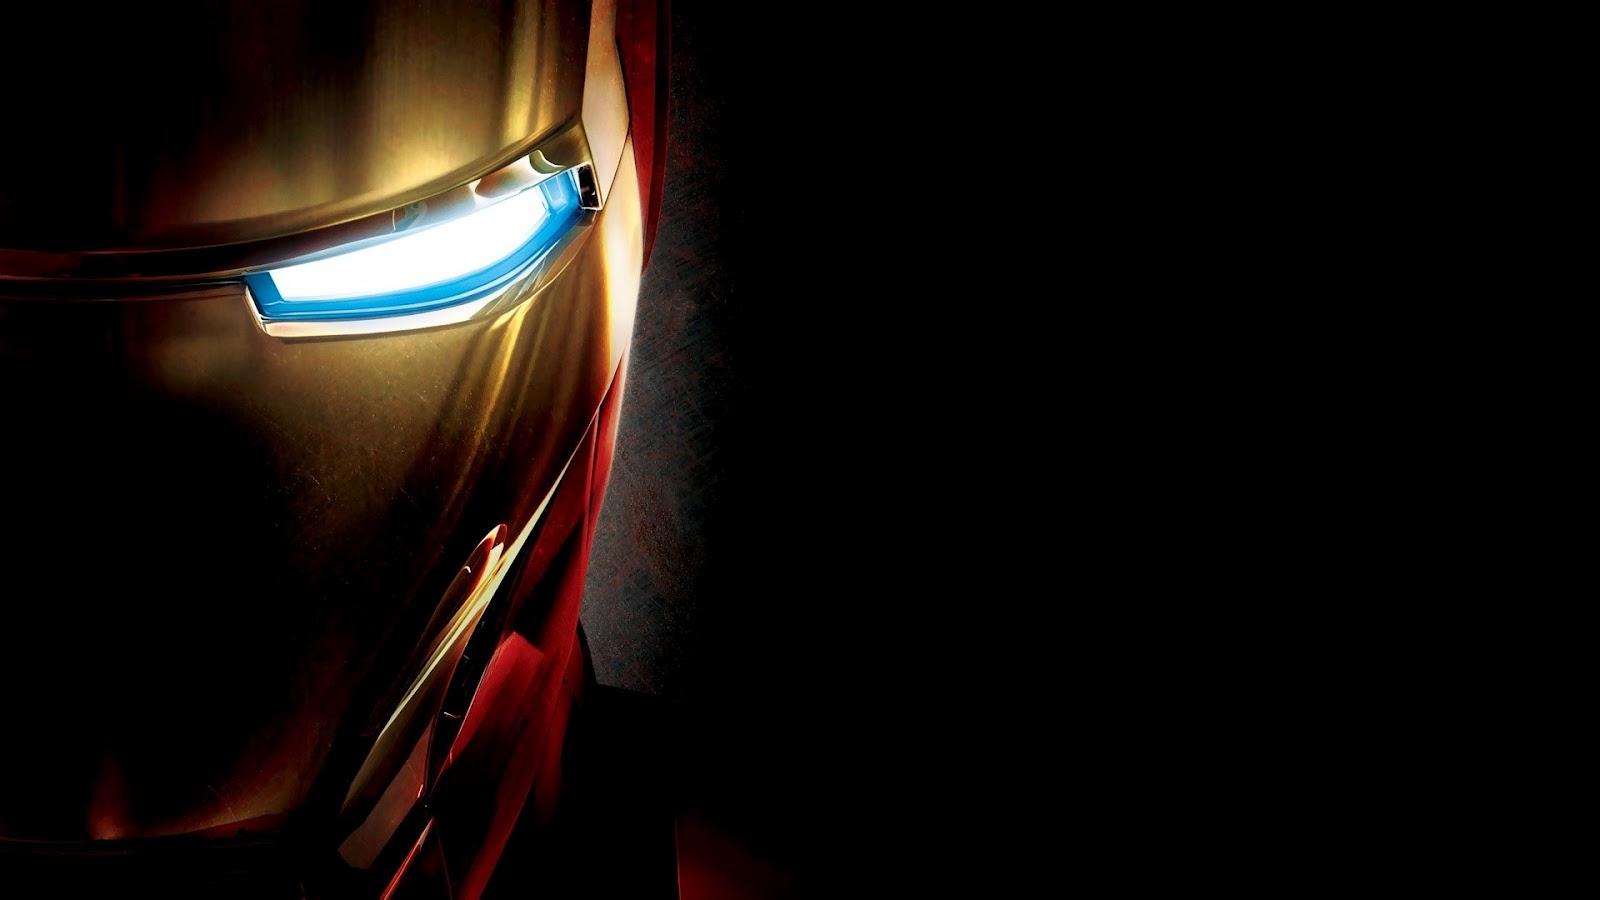 http://3.bp.blogspot.com/-pNUpV57_UwU/UBHYPbqzCLI/AAAAAAAACGE/YqLSgXf5NoU/s1600/Ironman+1+wallpapers+4.jpg